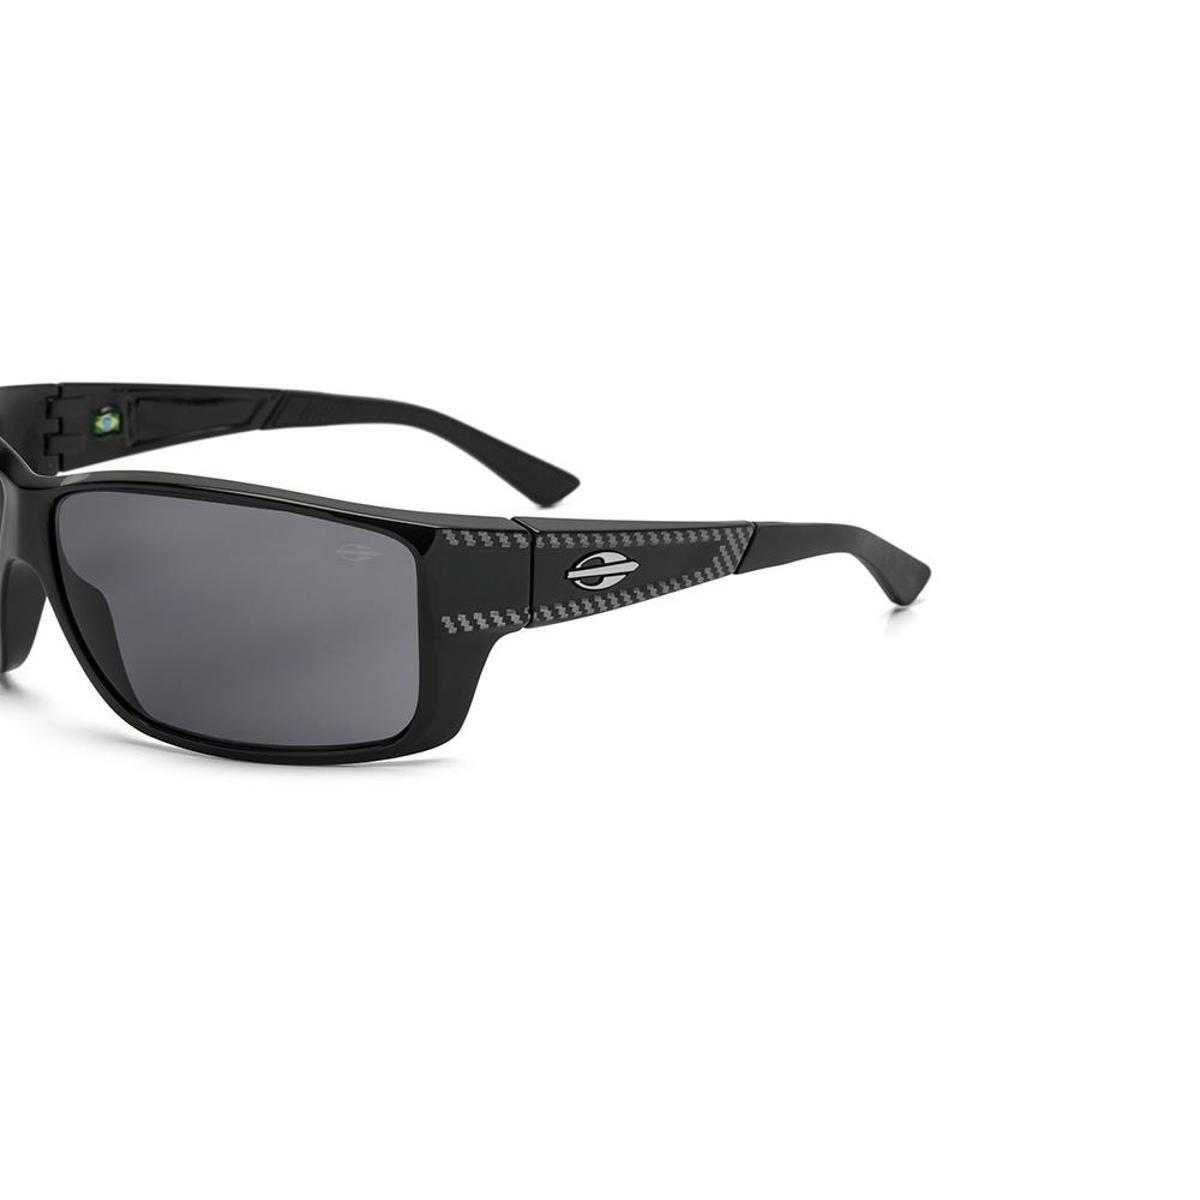 23b87259621ba Óculos De Sol Mormaii Joaca Iii - Preto - Compre Agora   Zattini